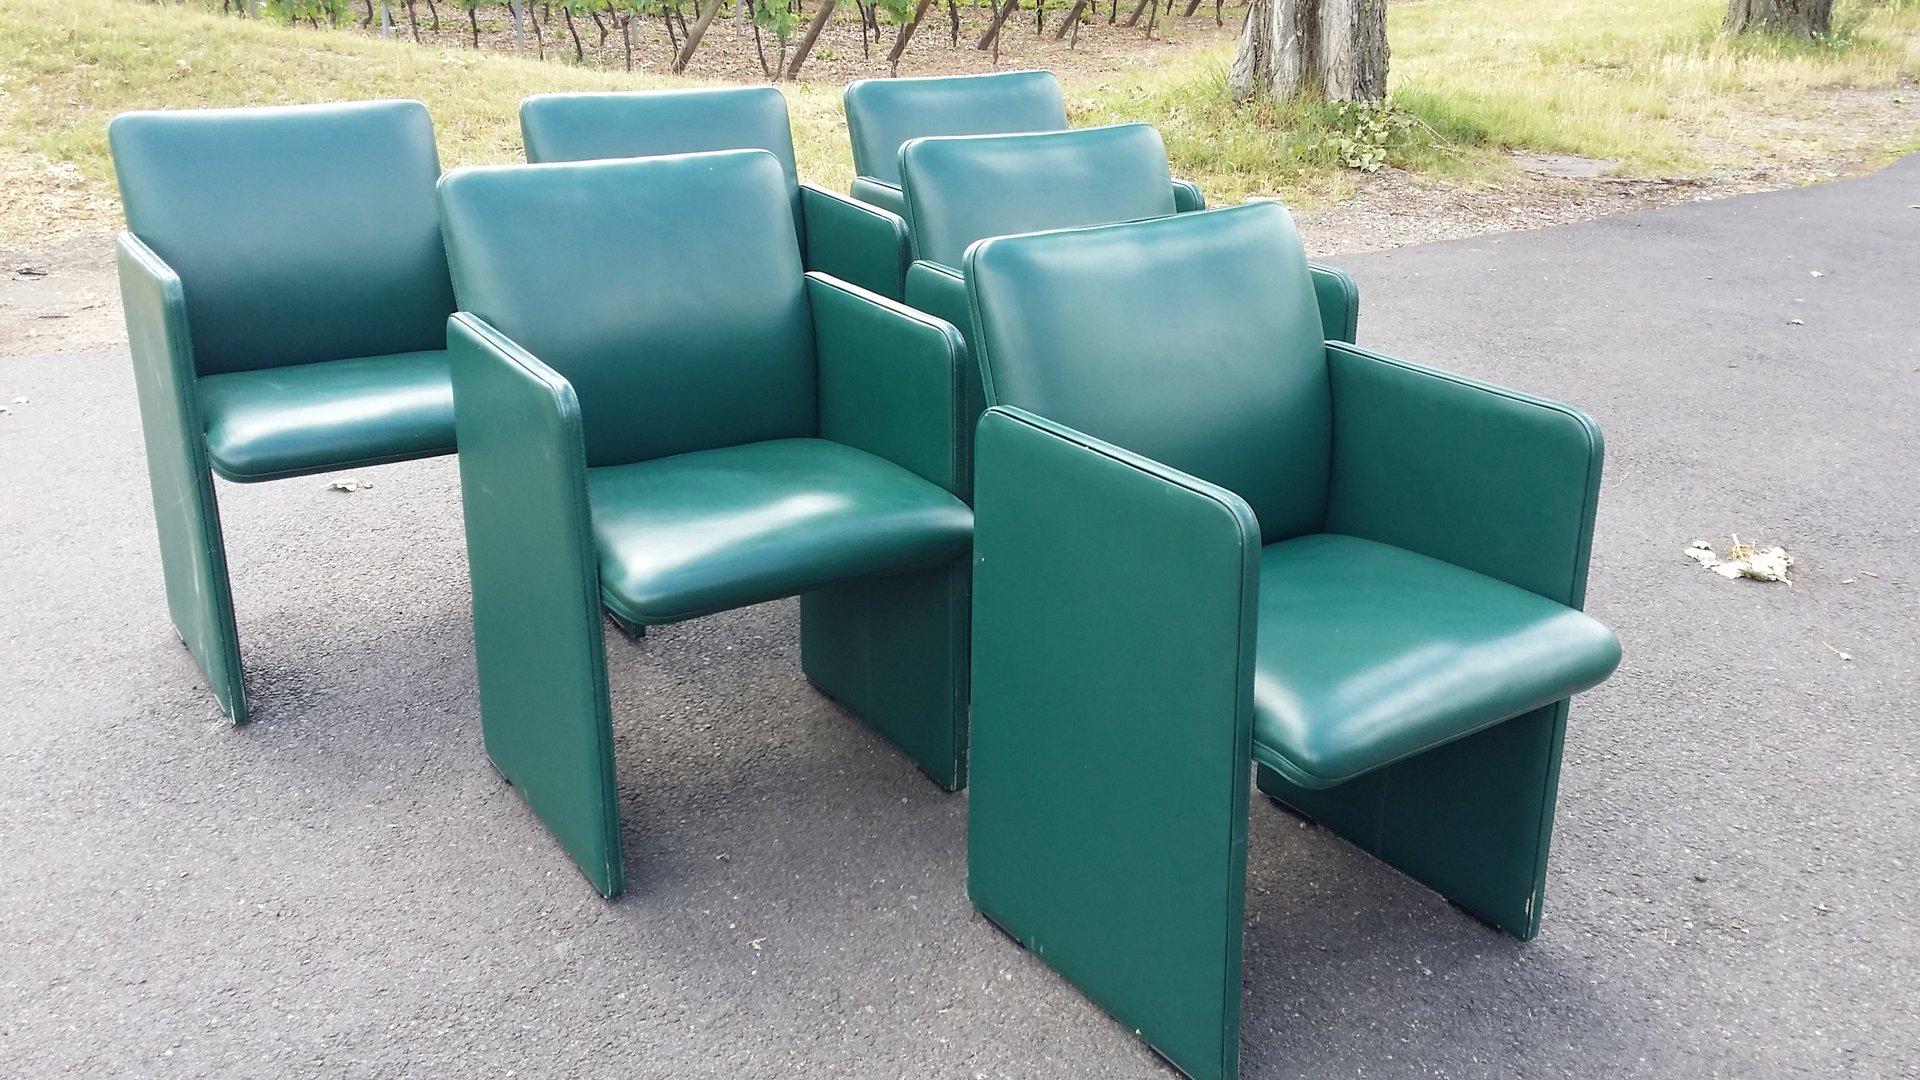 Vintage Italian Armchair by Luigi Massoni for Poltrona Frau for